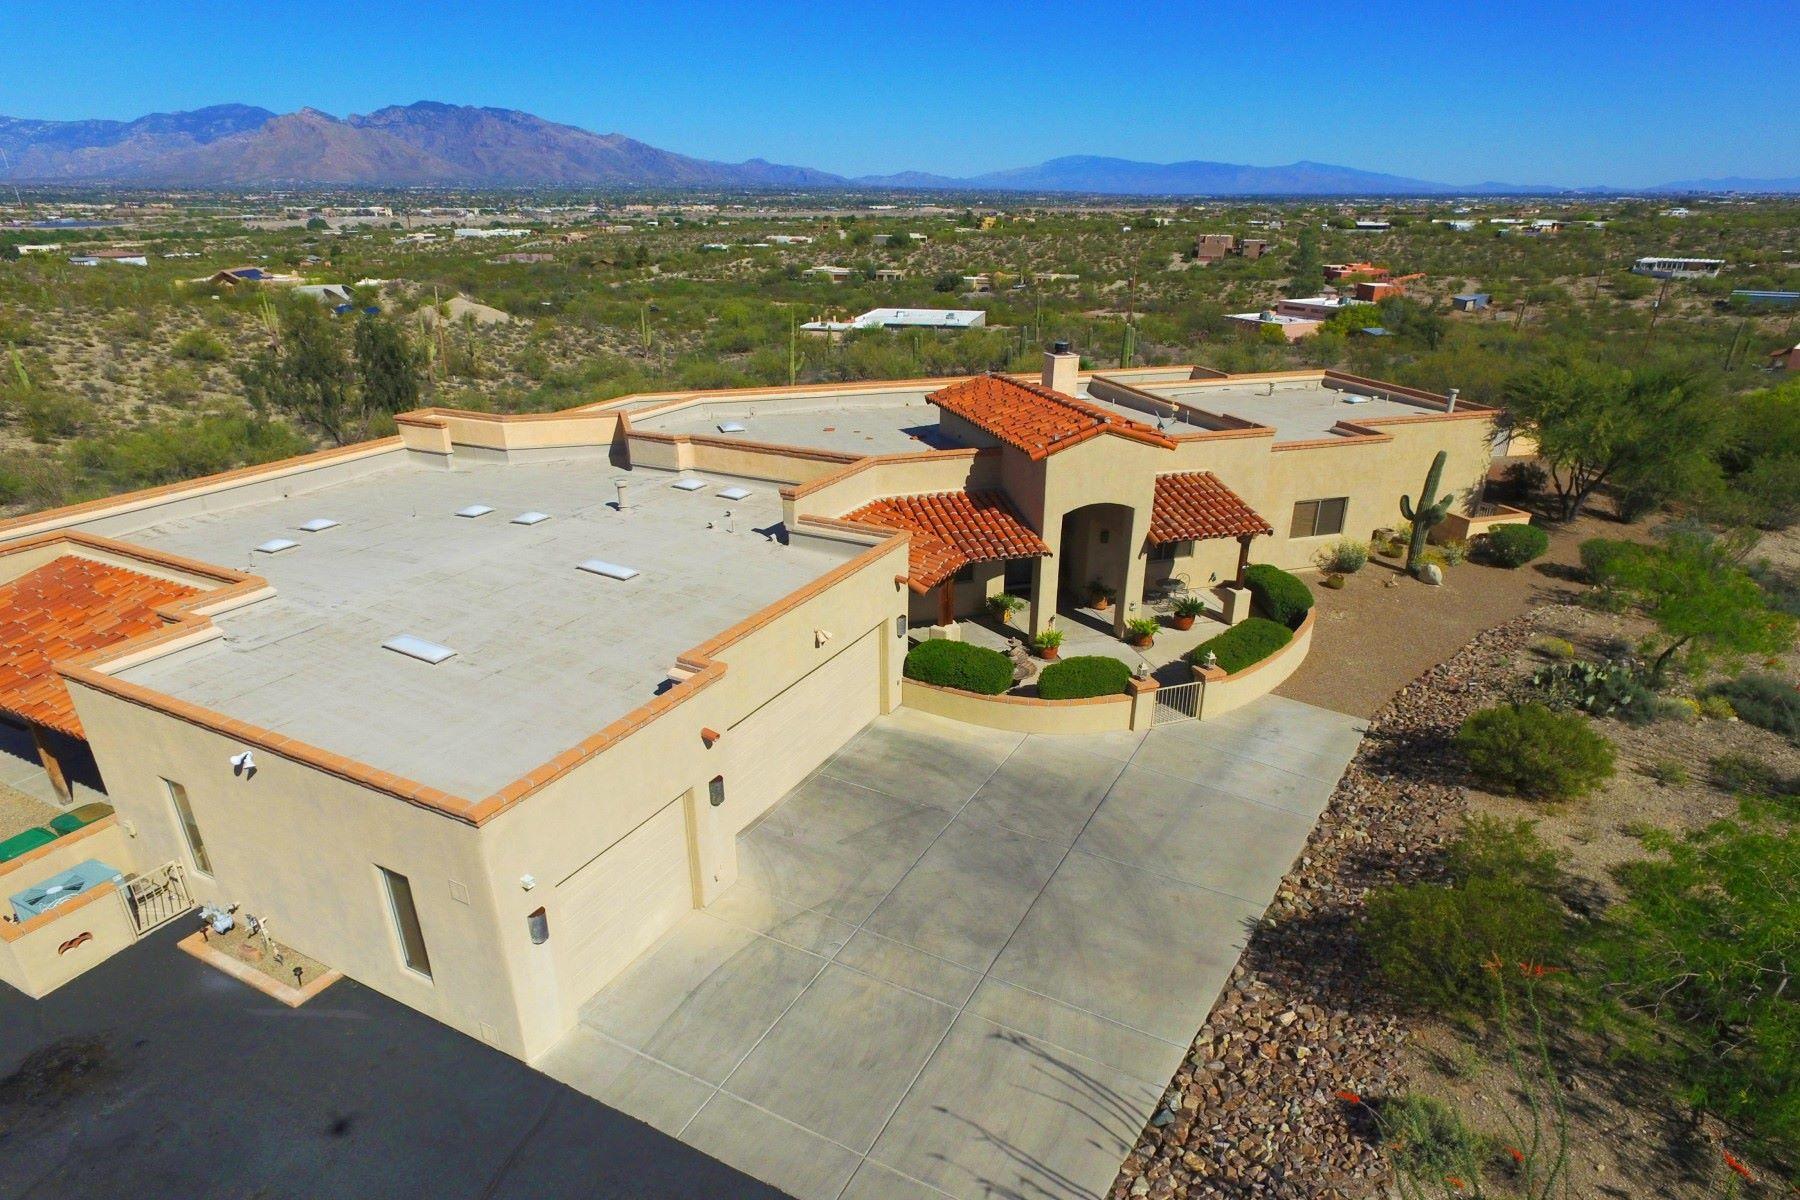 独户住宅 为 销售 在 Lovely Tucson home overlooking the city 5465 W Black Powder Place 图森, 亚利桑那州, 85743 美国